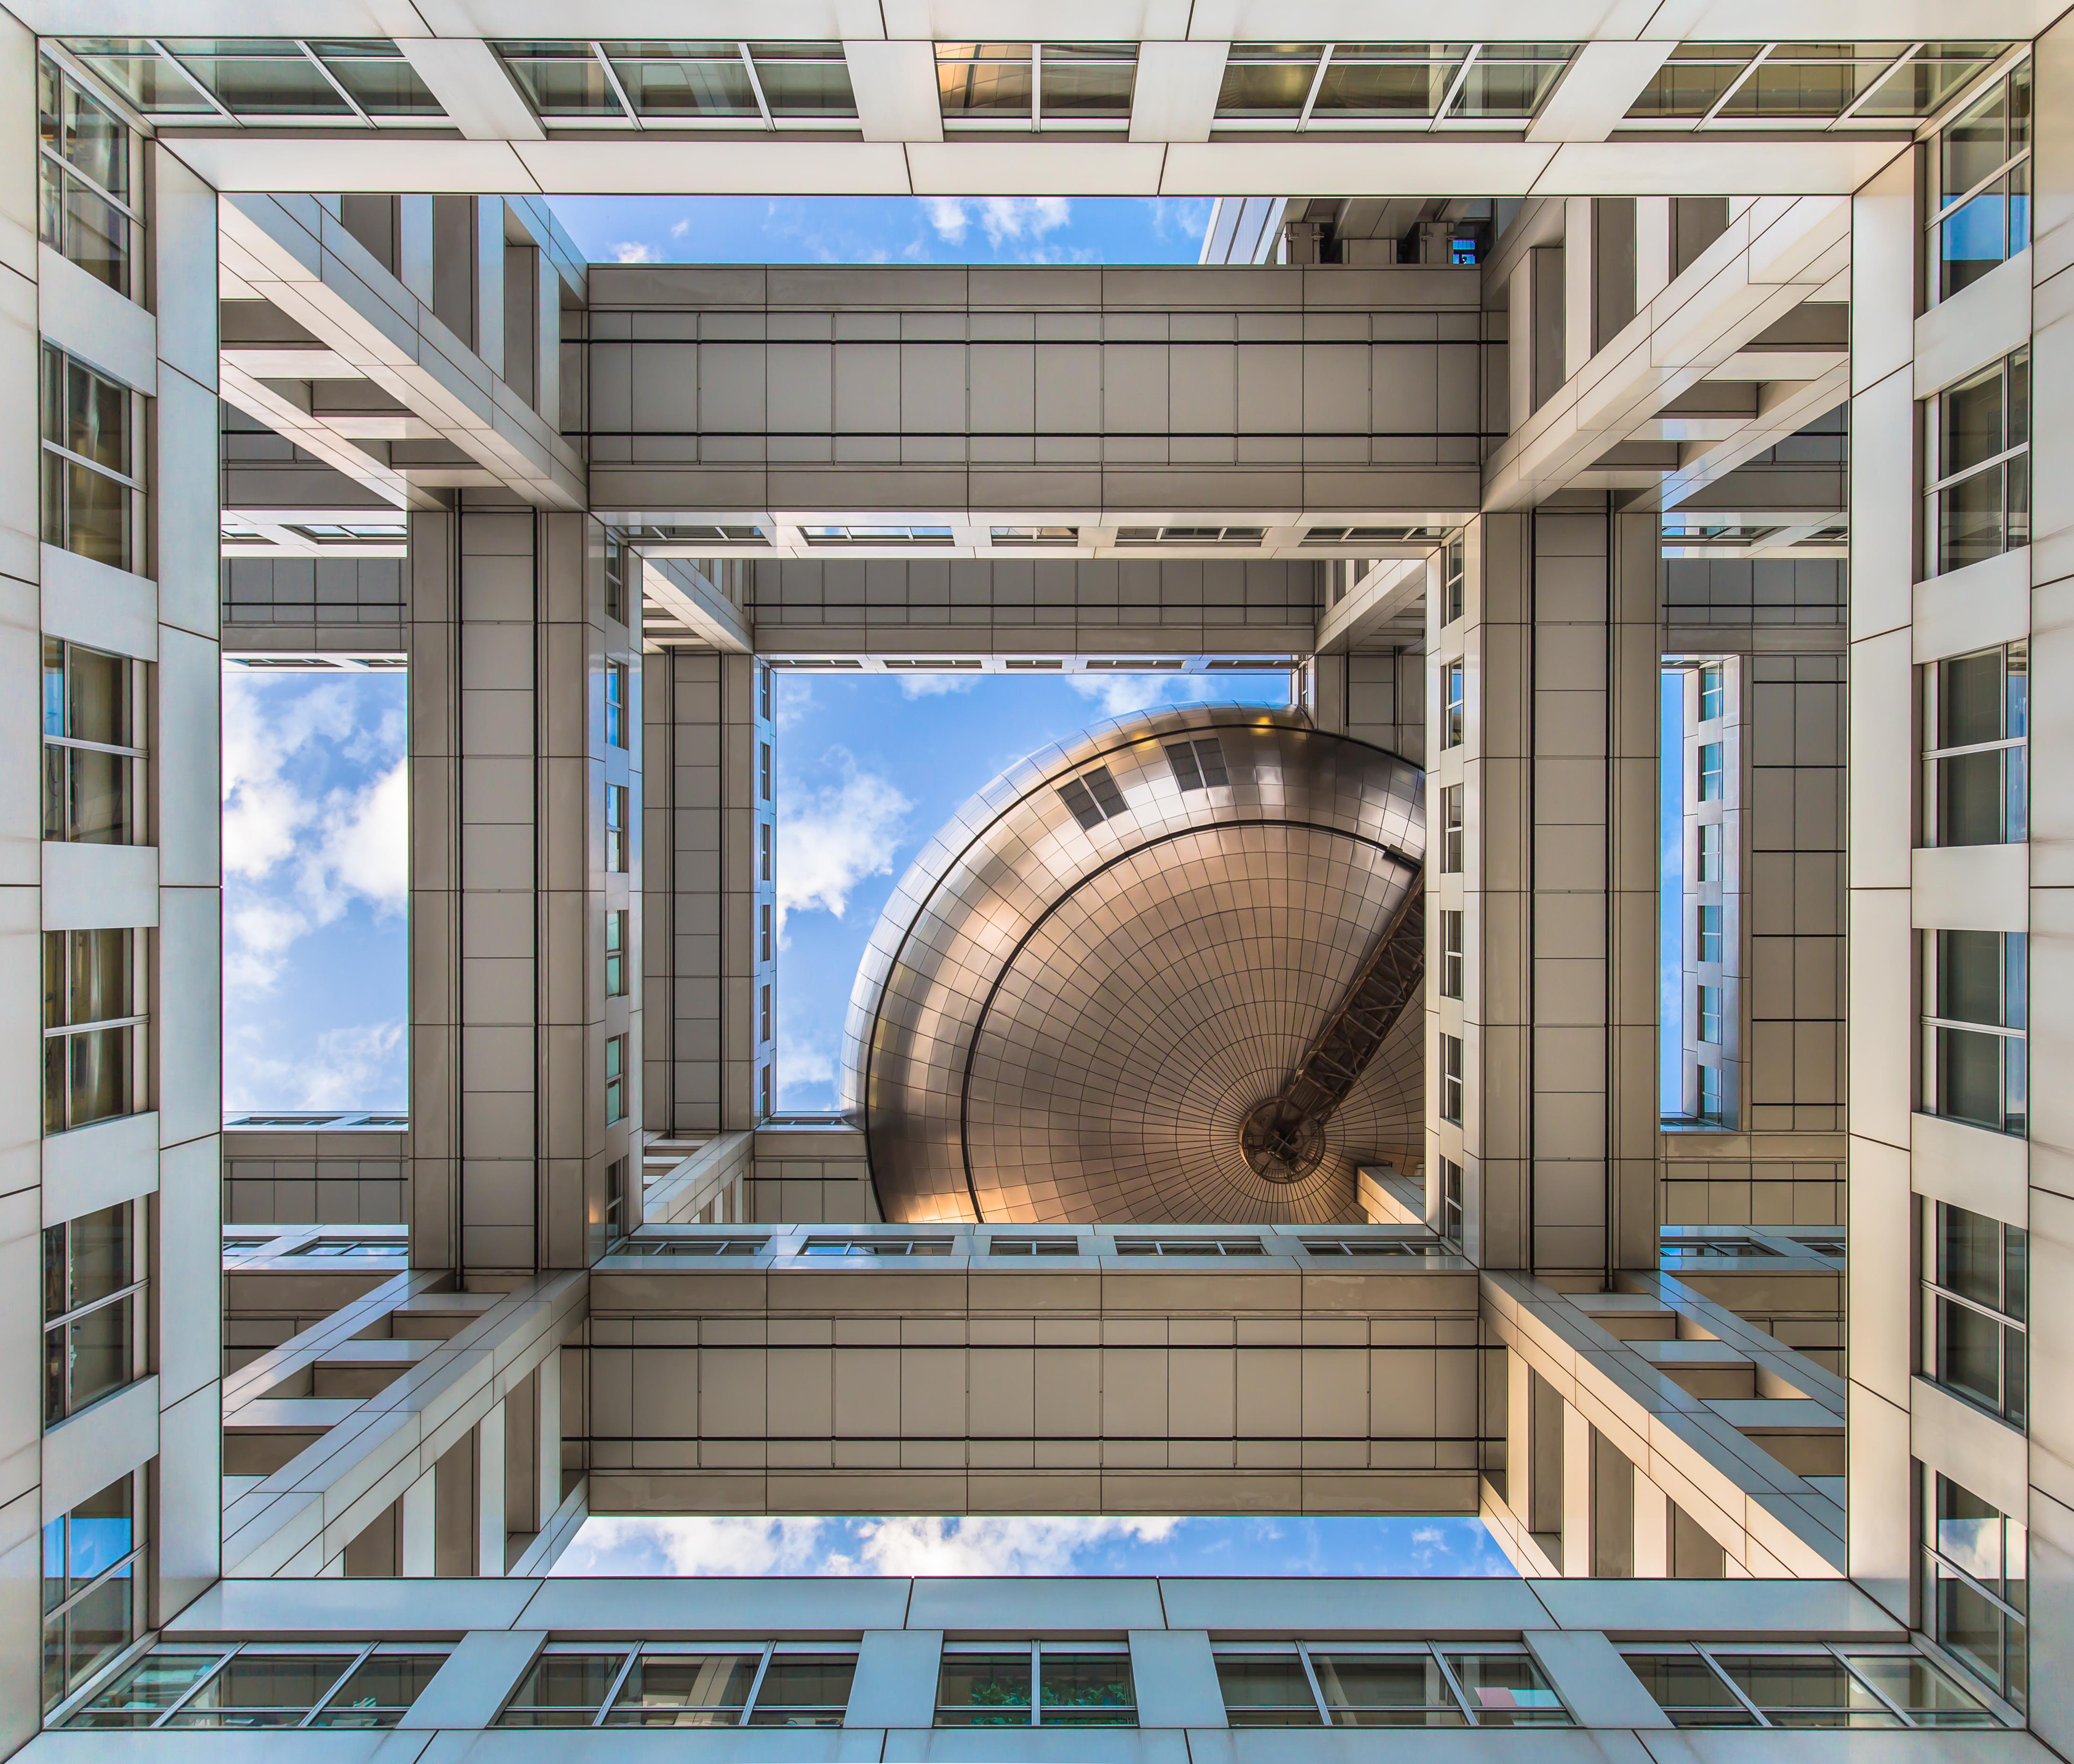 Space station - Odaiba, Tokyo